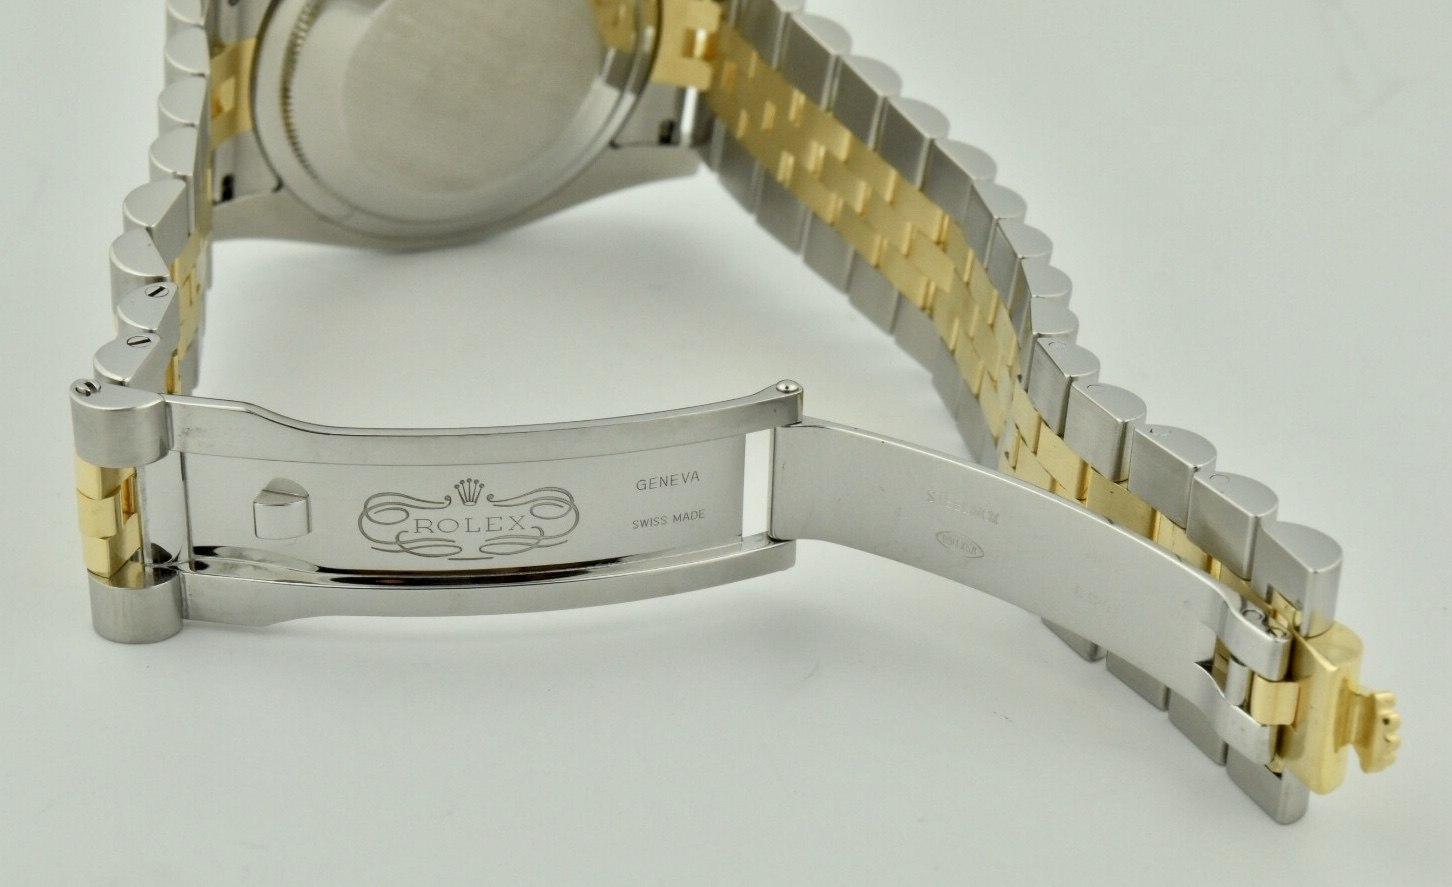 IMG 7974 - Rolex Datejust 36mm